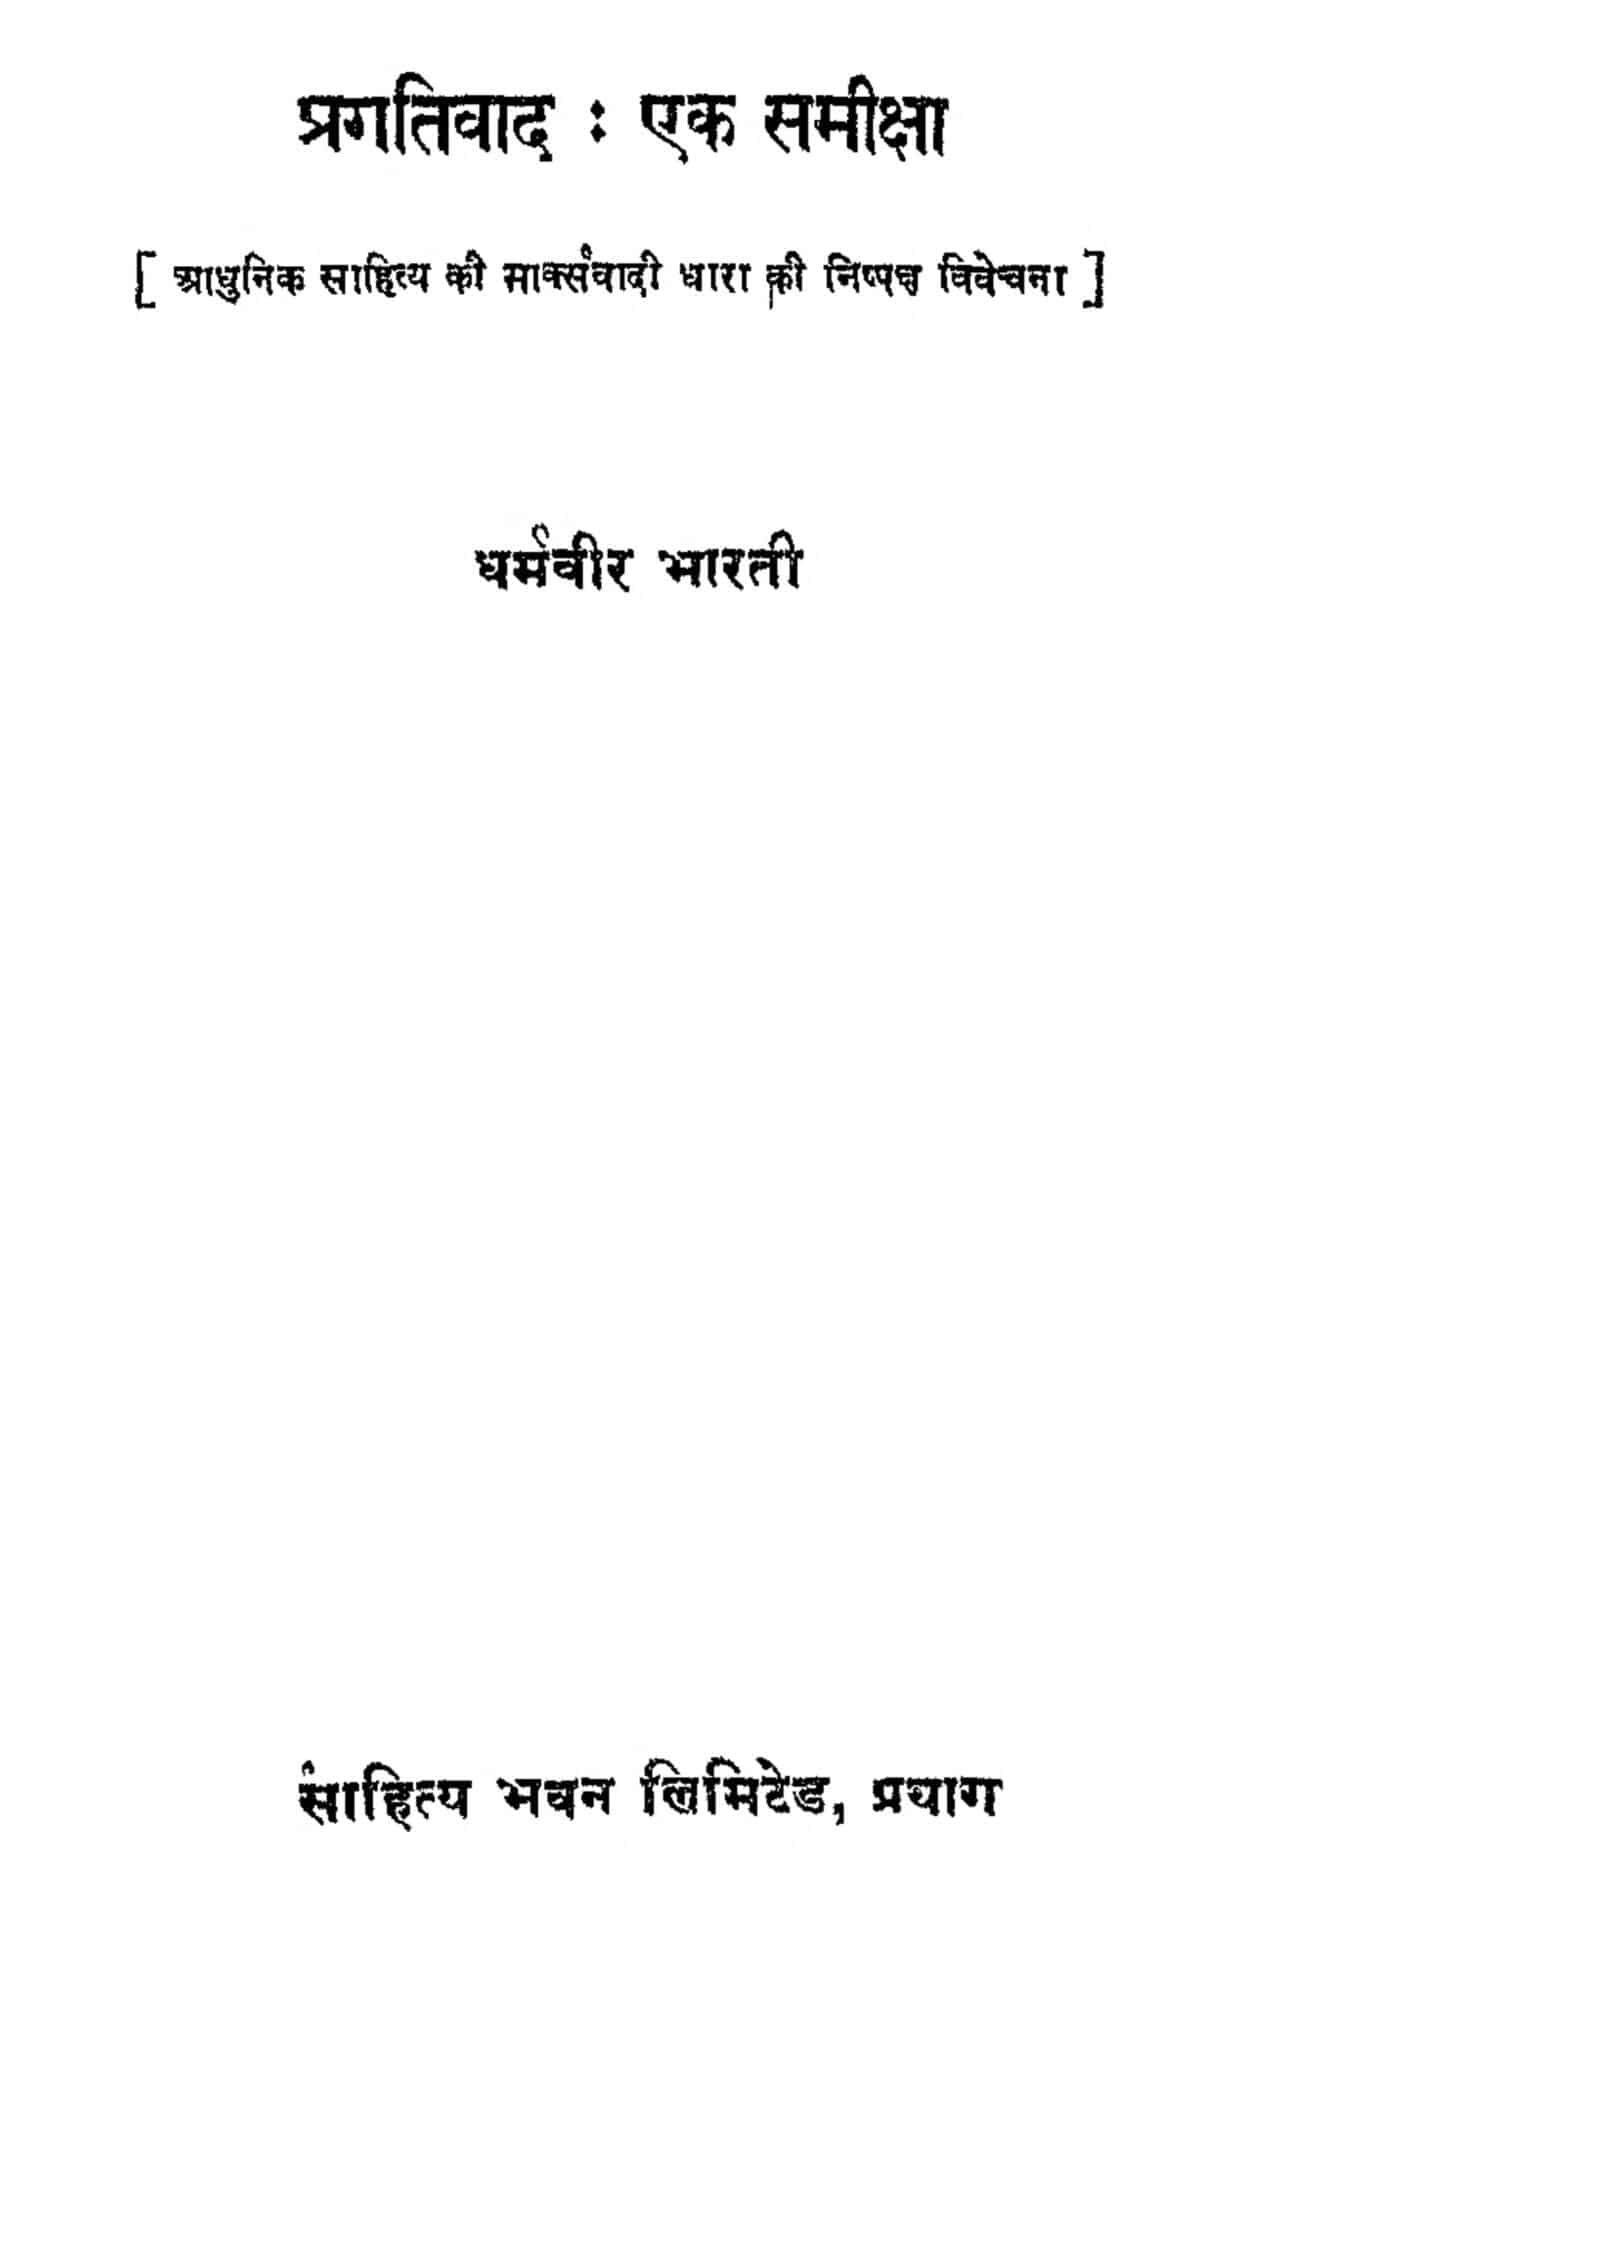 Book Image : प्रगतिवाद एक समीक्षा - Pragativad Ek Samiksha